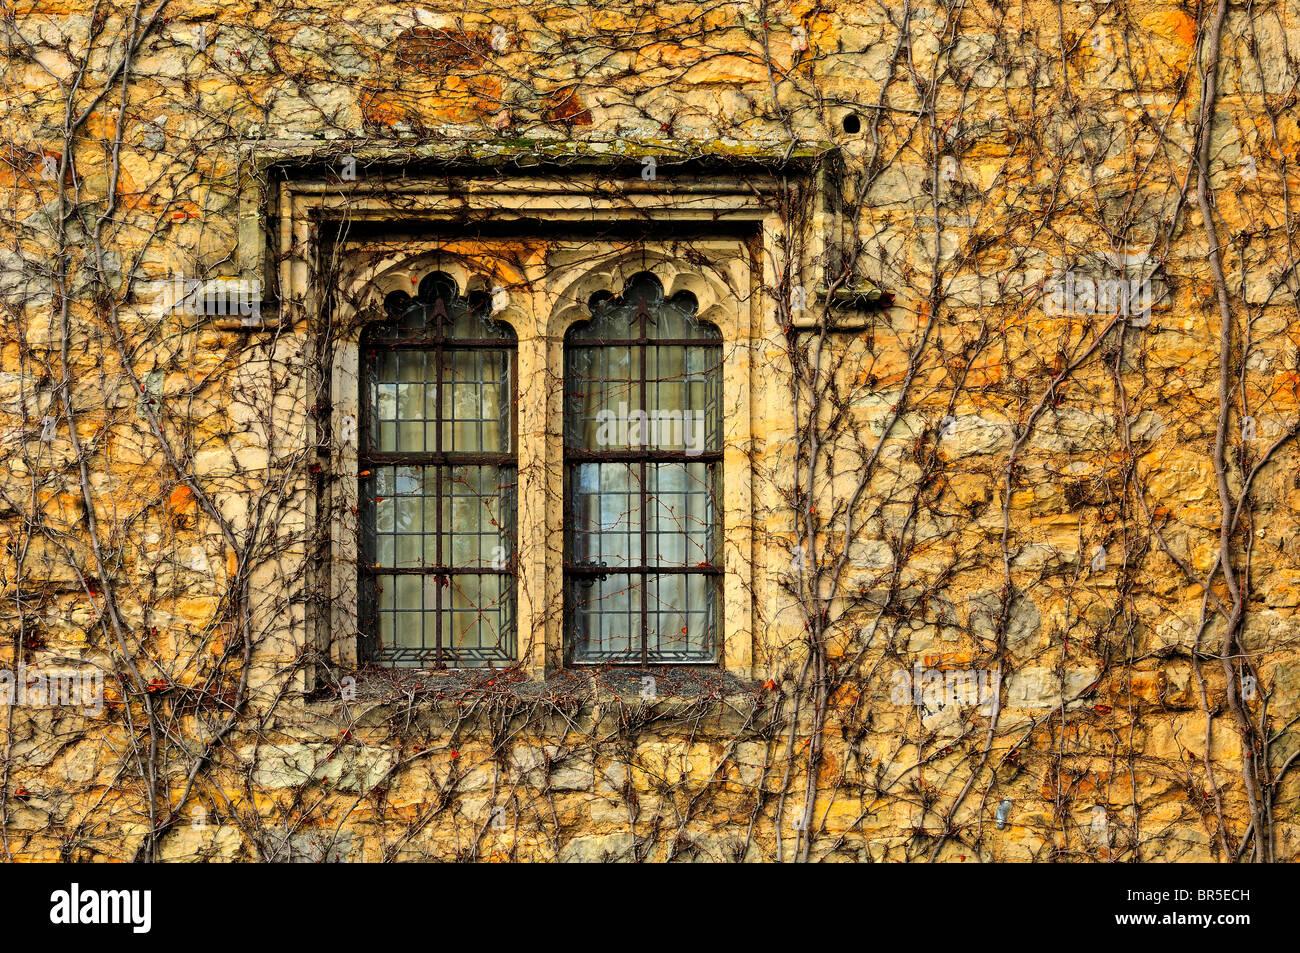 window gothic style stockfotos window gothic style bilder alamy. Black Bedroom Furniture Sets. Home Design Ideas